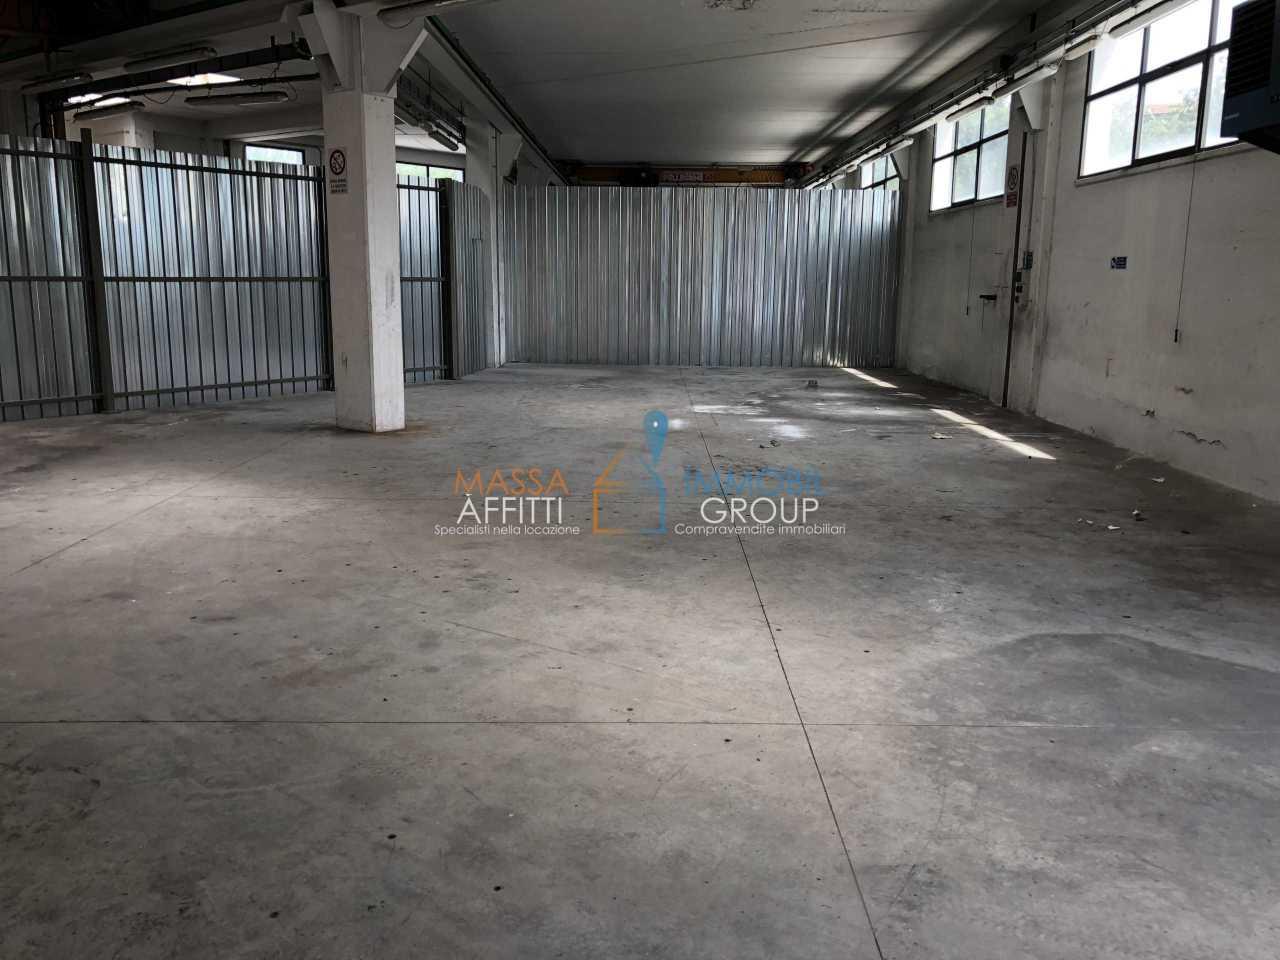 Capannone / Fondo - Industriale/Artigianale a Carrara Rif. 7105541